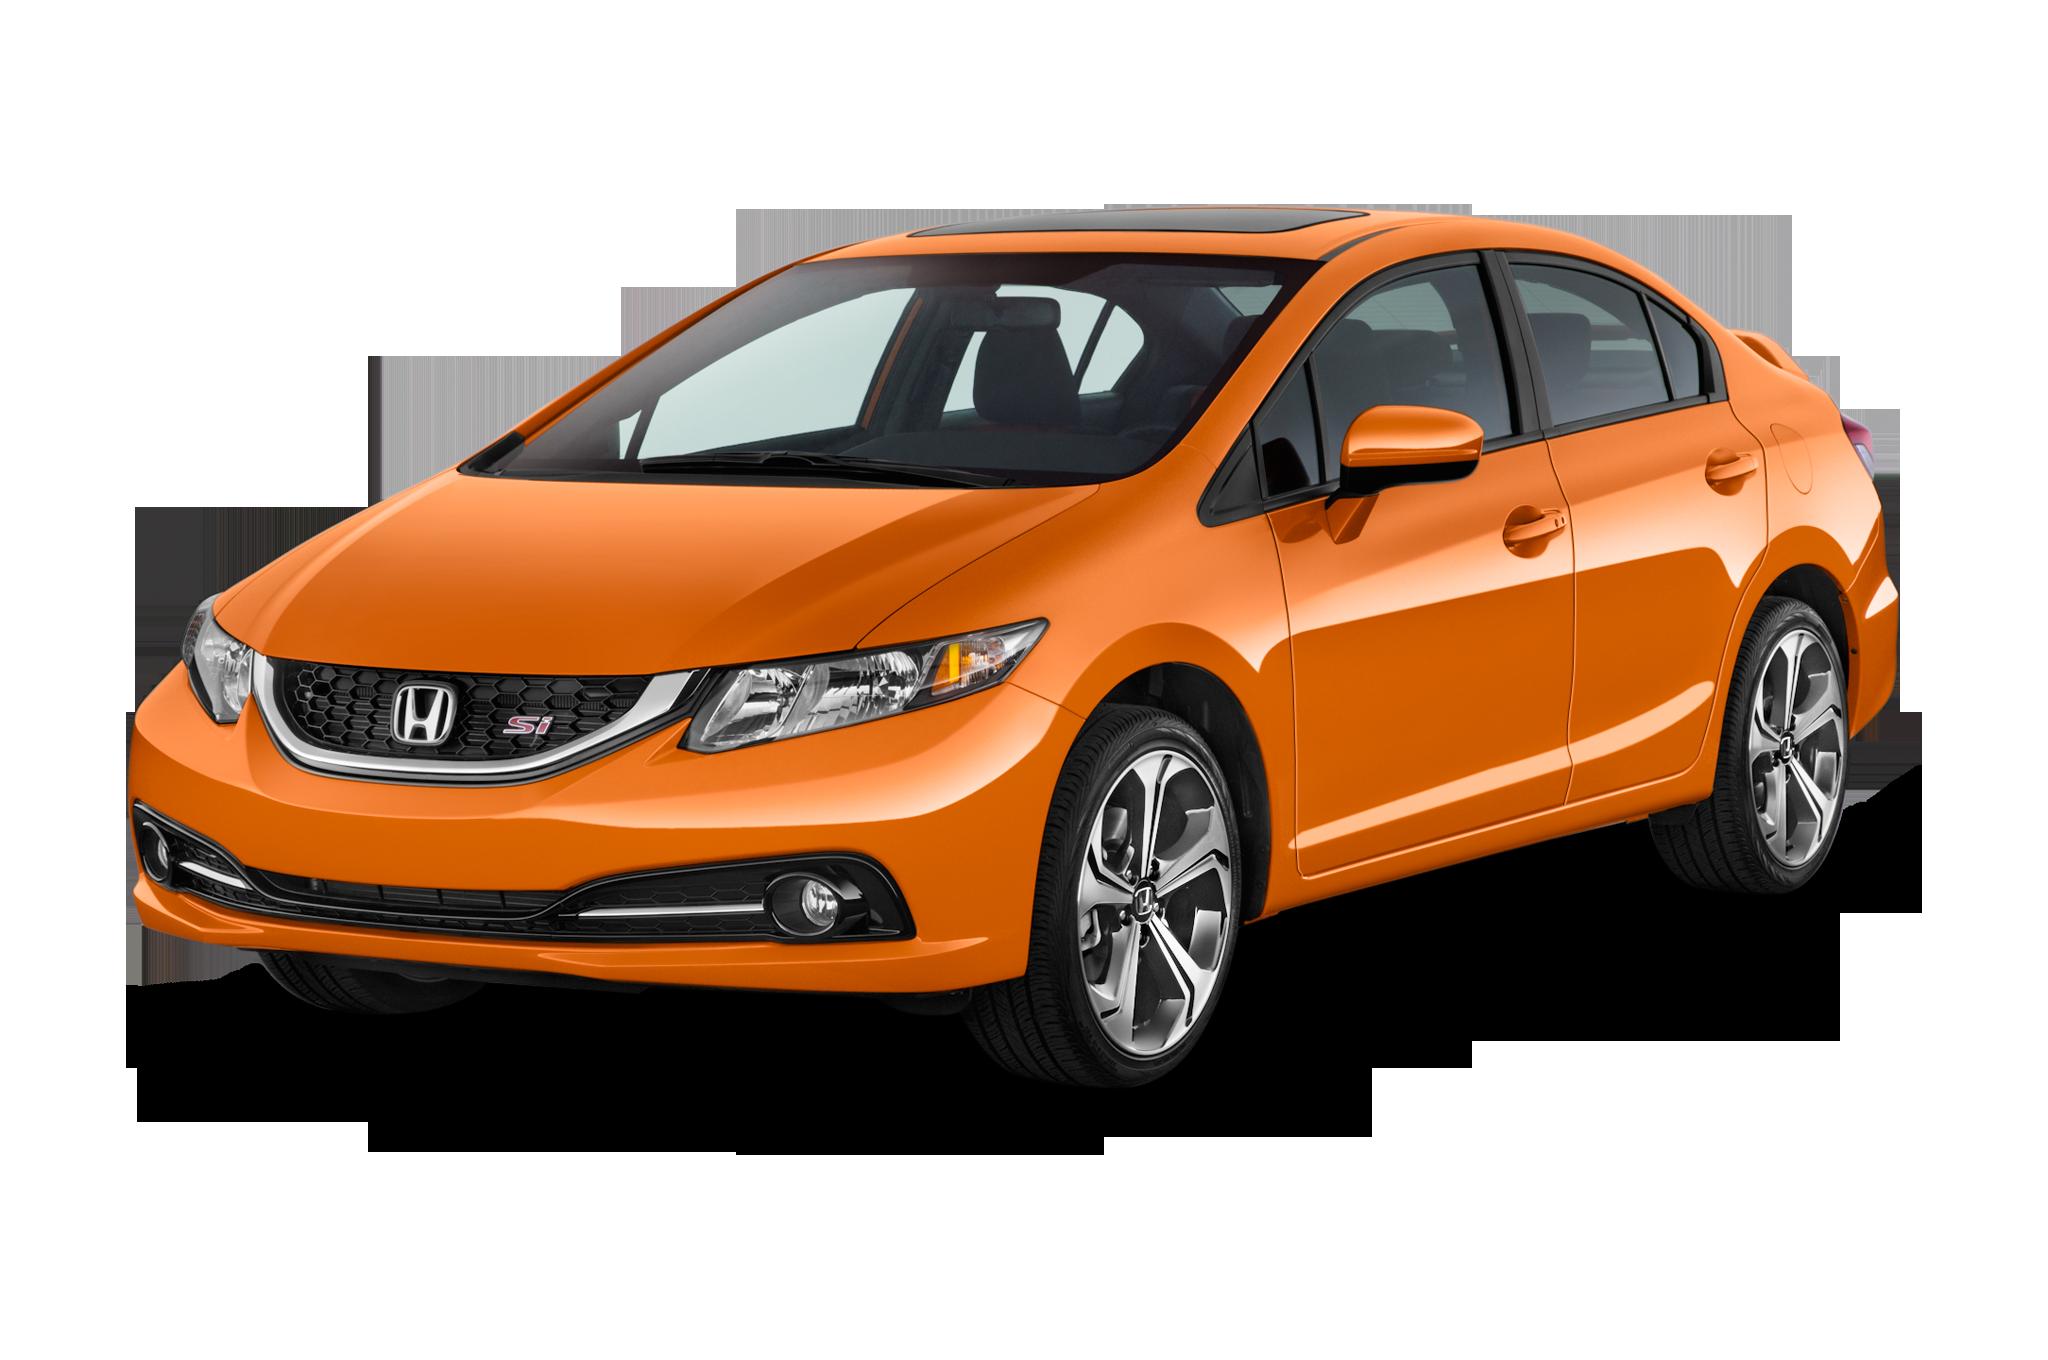 2014 Honda Civic Coupe Revealed At 2013 Los Angeles Auto